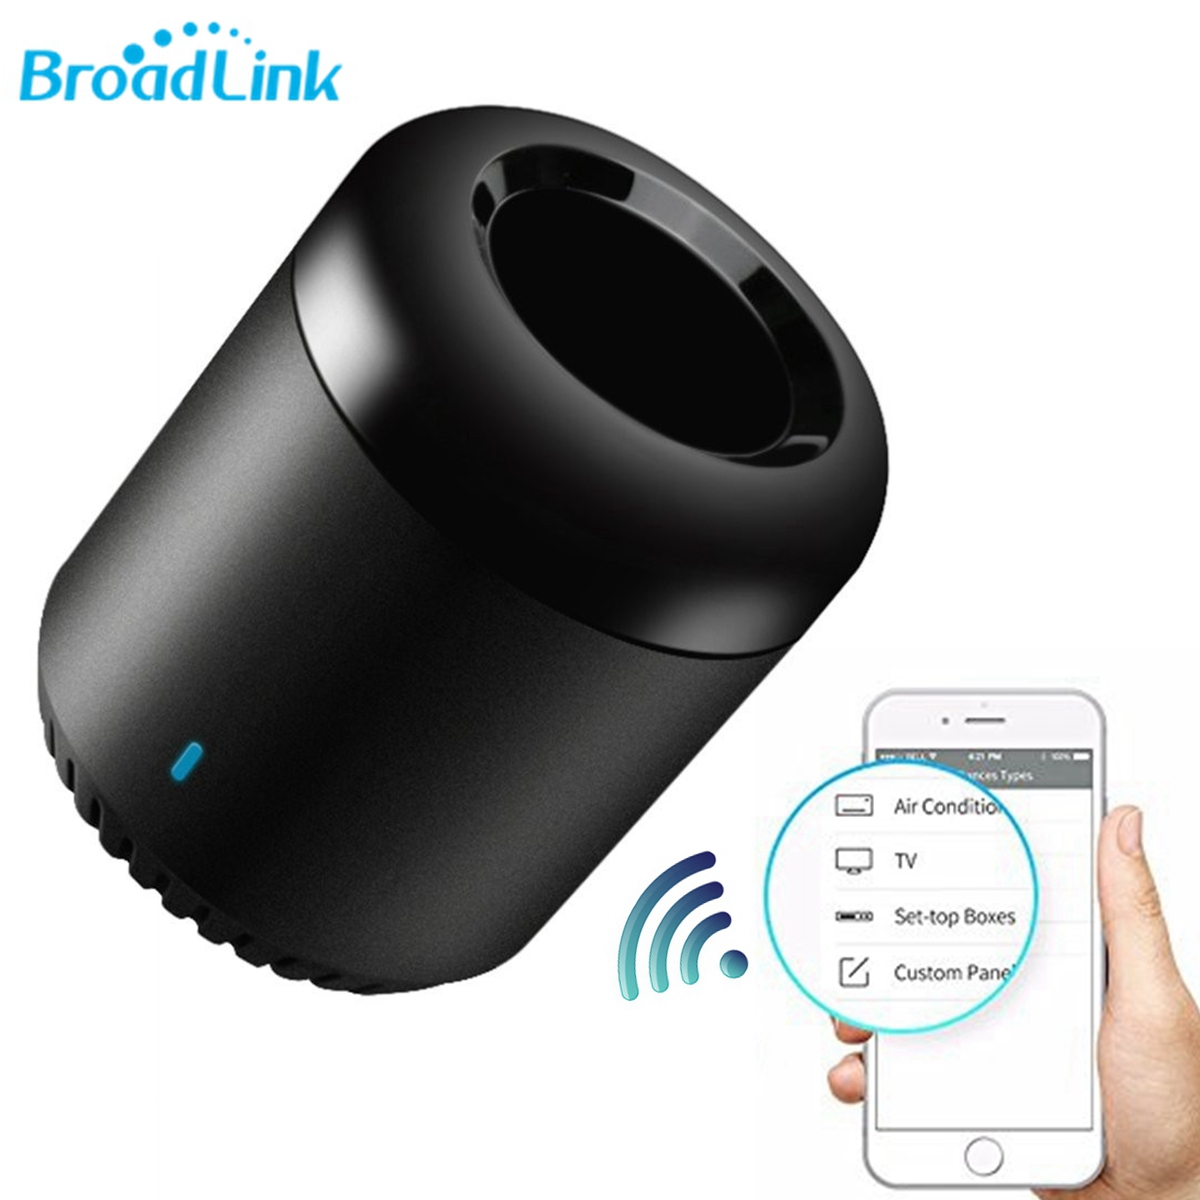 Broadlink NEW Upgrade RM Mini 3 Black Bean Smart Home WiFi Universal IR Smart Wireless Remote Controller Intelligent WiFi IR цена 2017